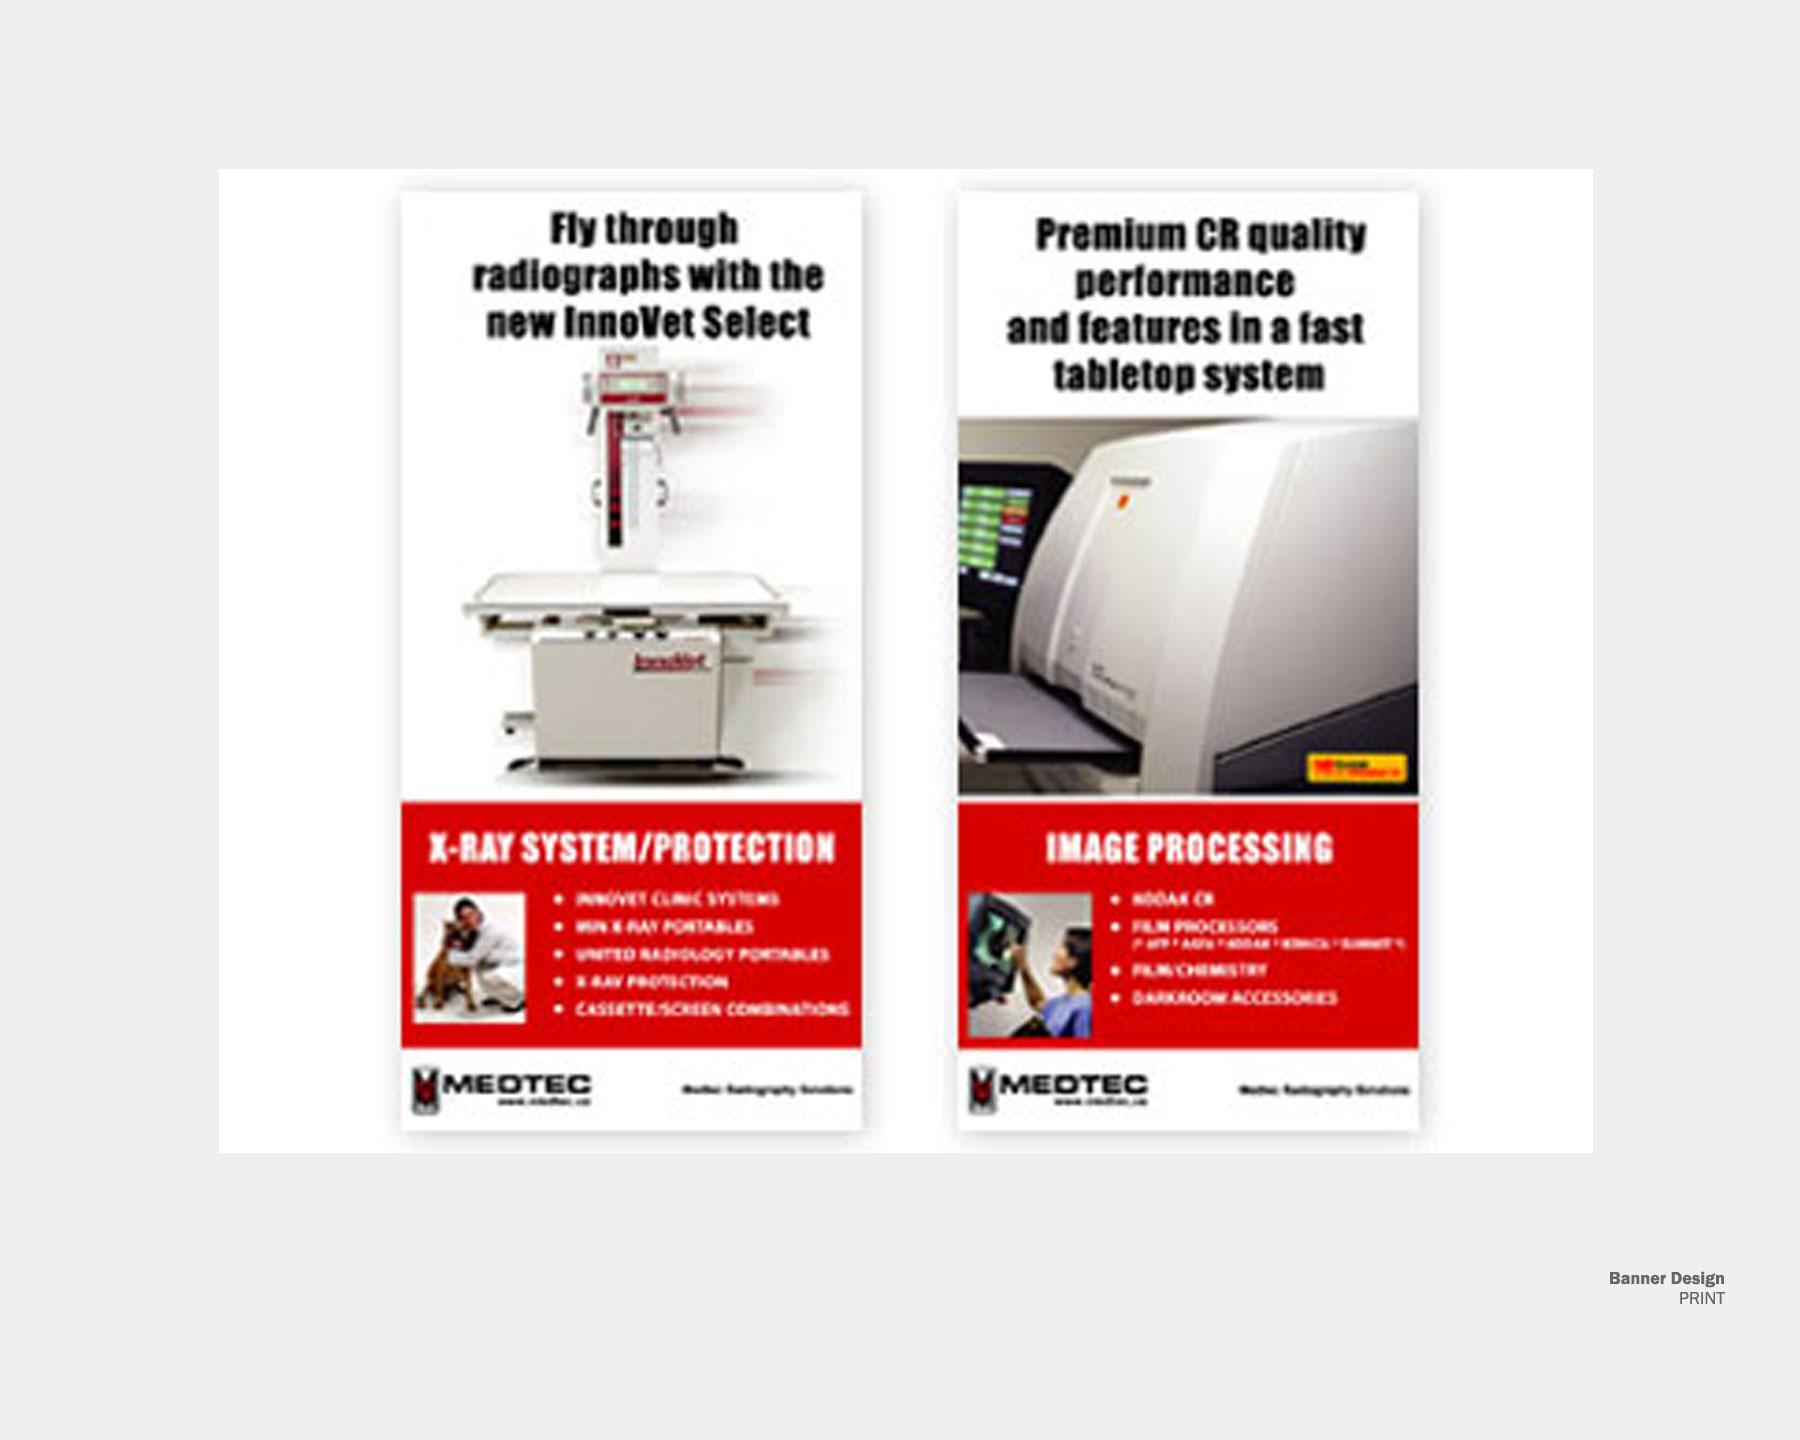 CMY-Print-Banner-Medtec